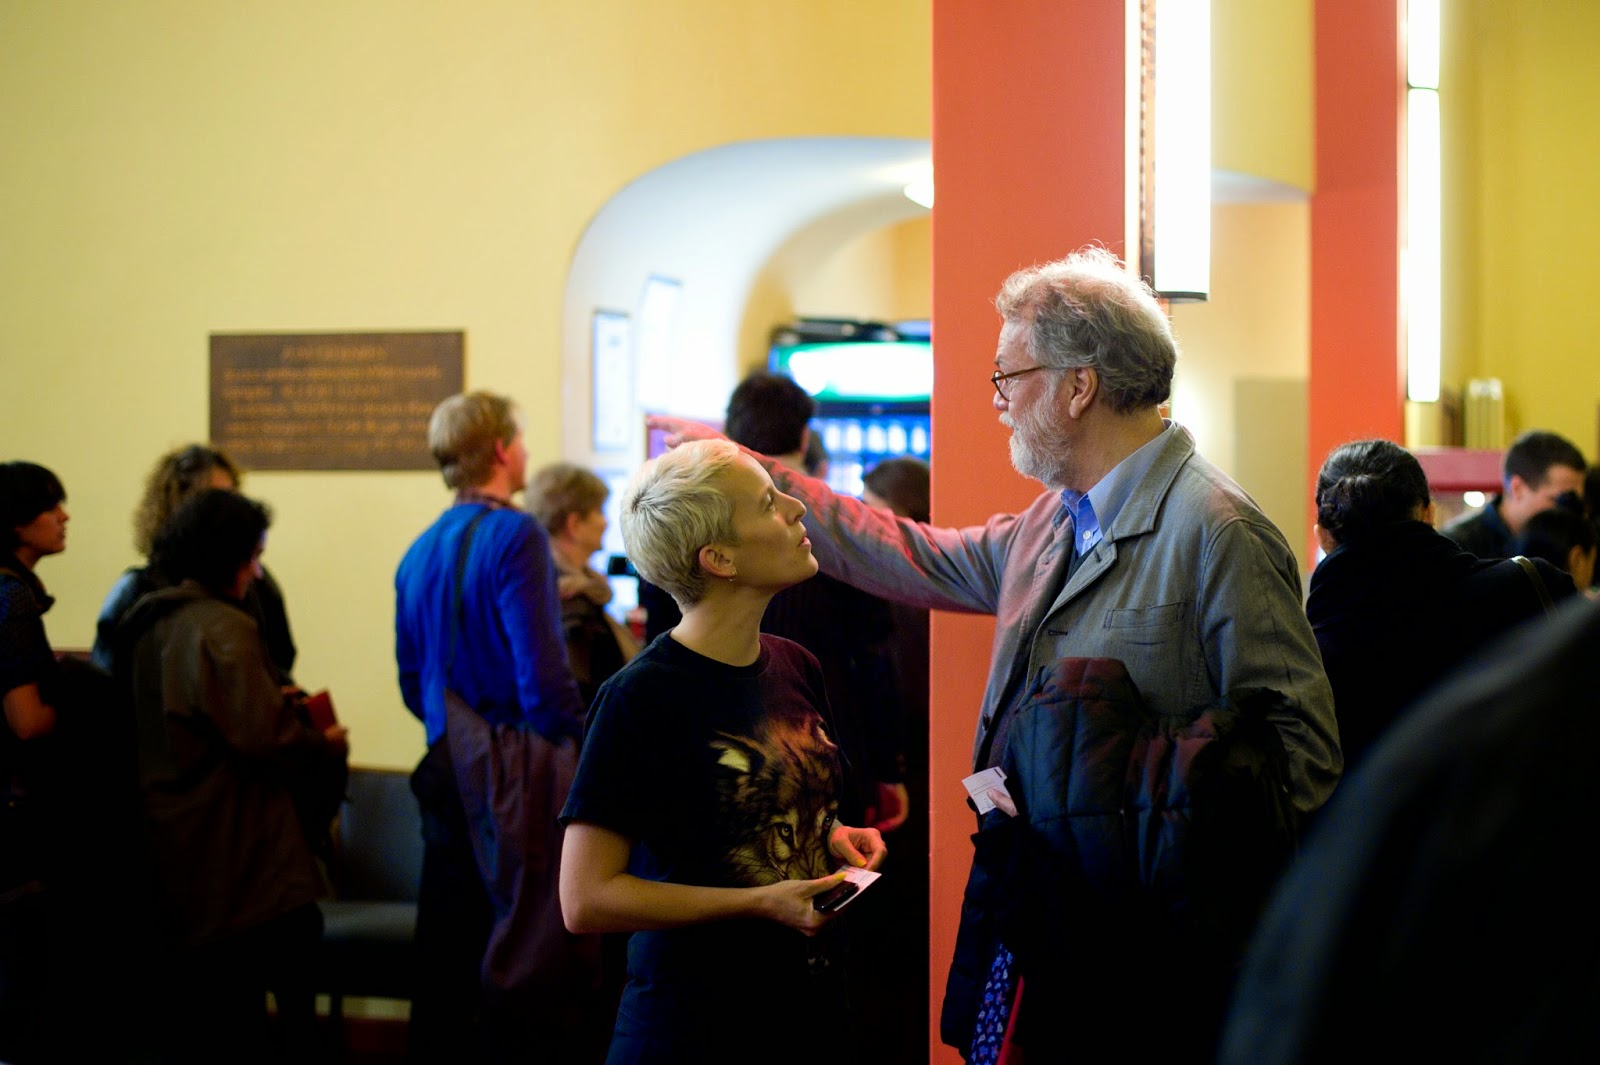 Candice Breitz in discussion with Wulf Herzogenrath